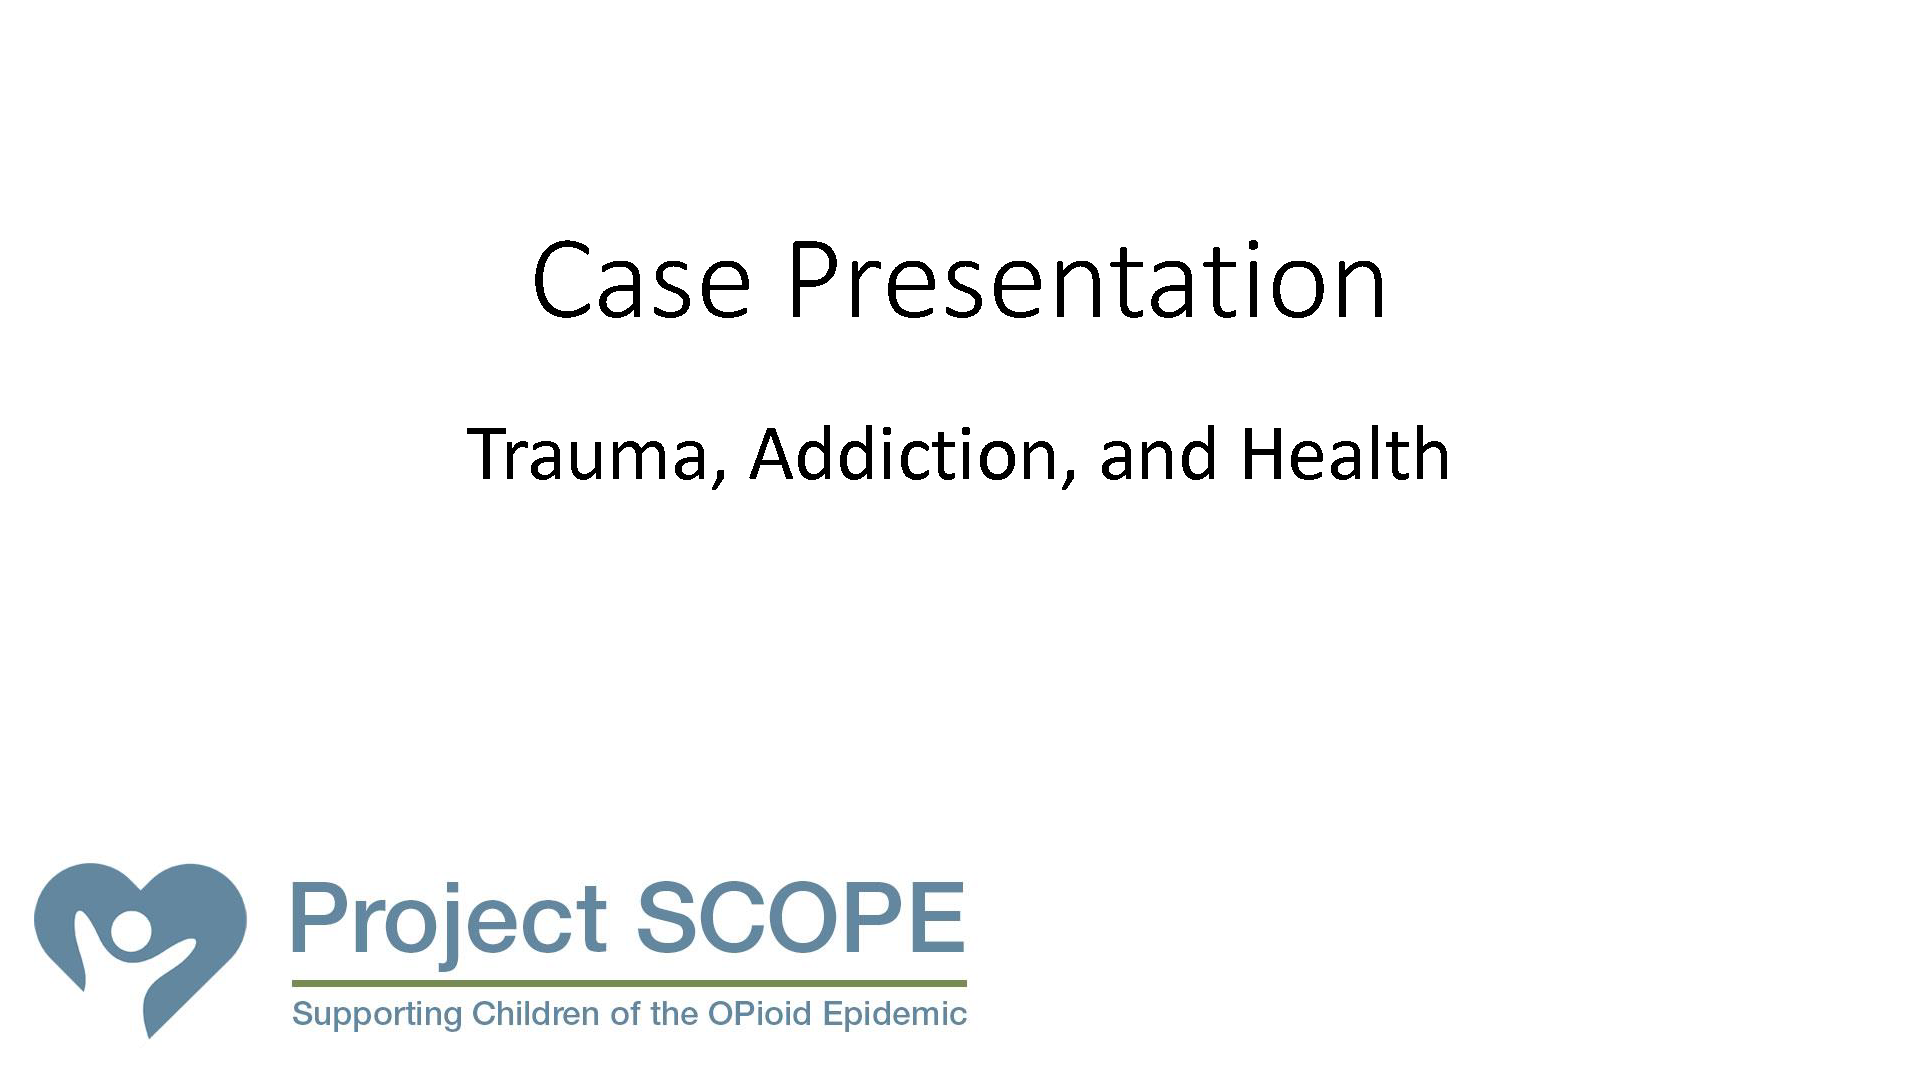 a snapshot of the NAS presentation